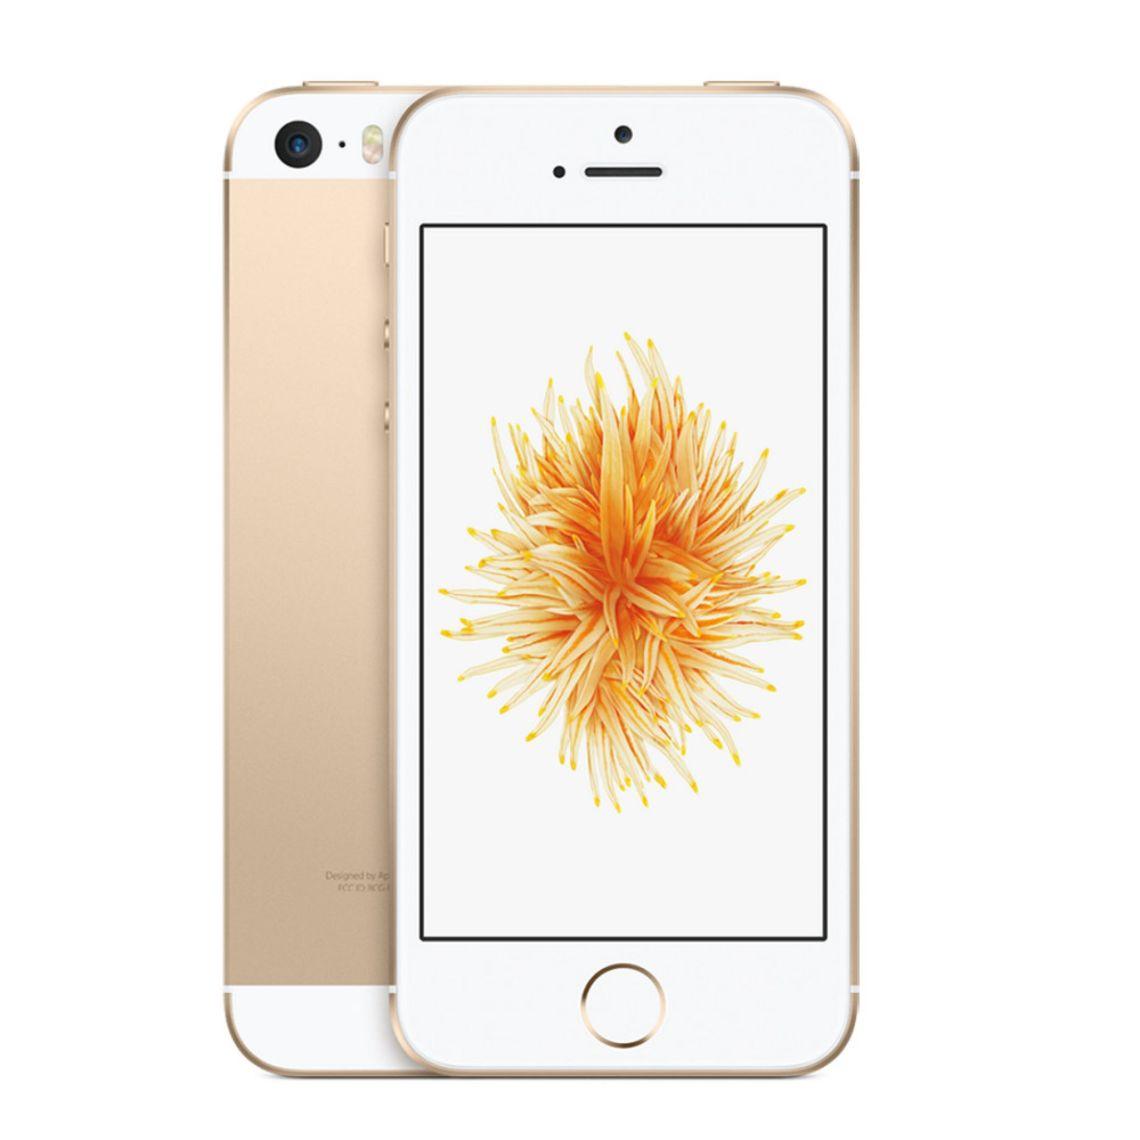 Apple iPhone SE 16GB IOS 9 GSM Unlocked Phone - Gold (Certified Refurbished) - Walmart.com